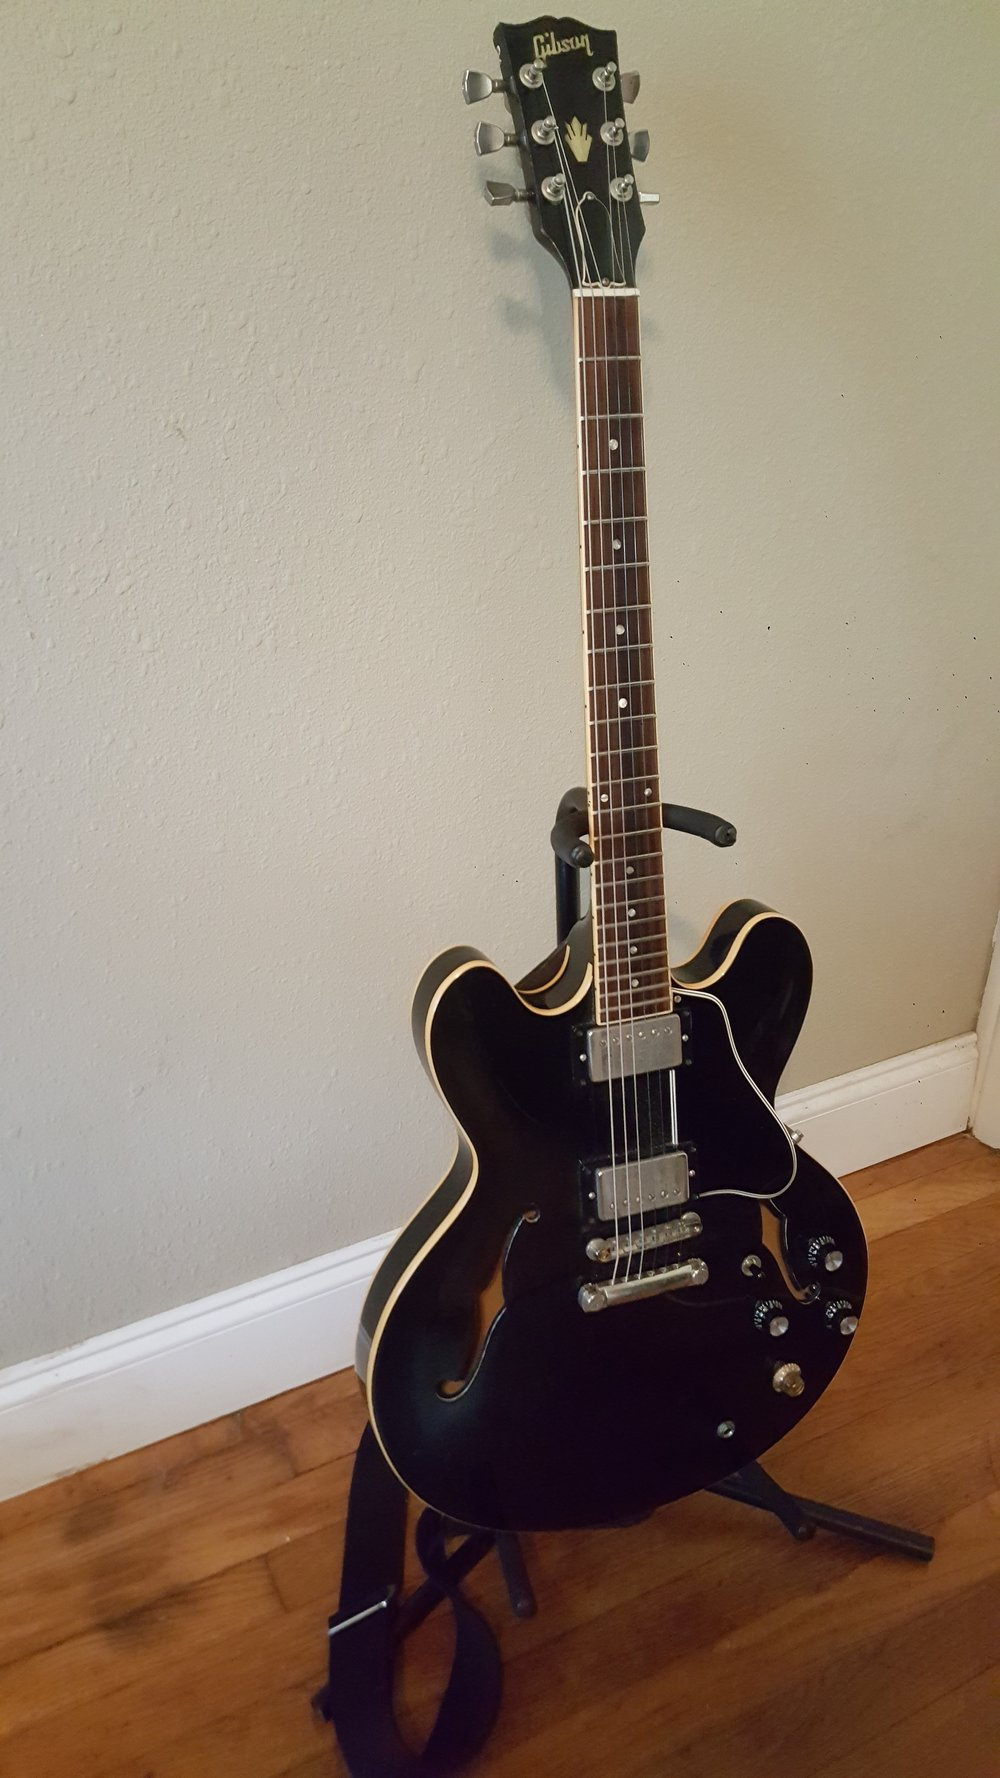 Black 1991 Gibson es-335